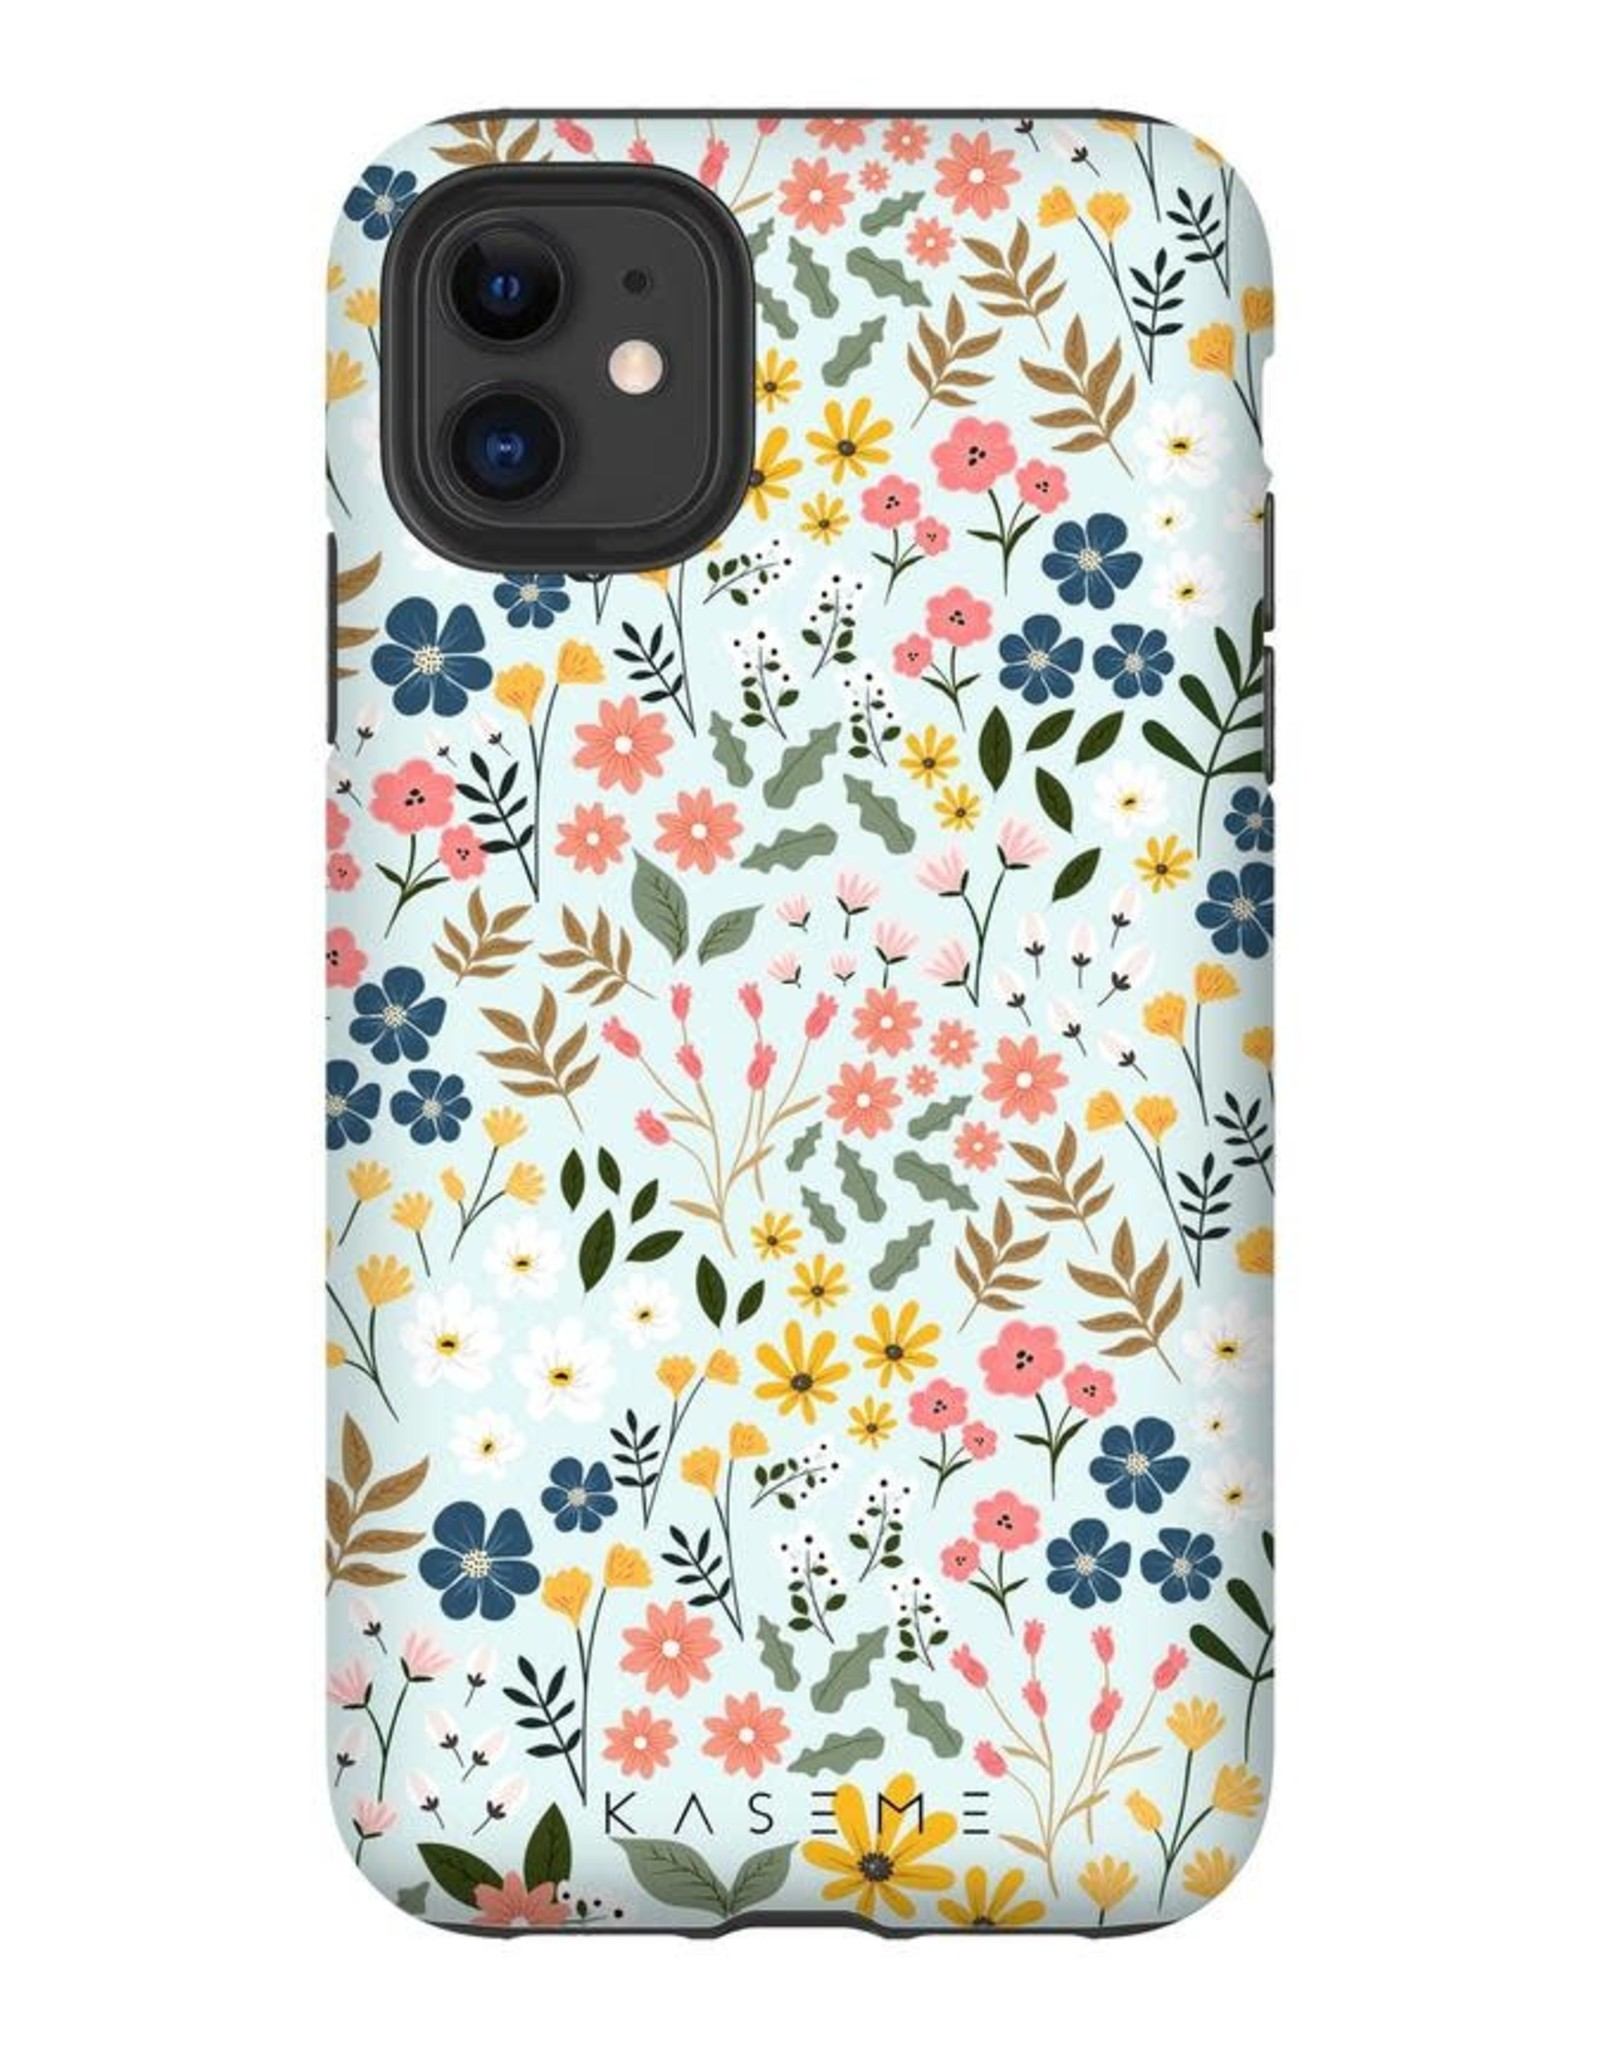 Kaseme Kaseme - Étui cellulaire IPhone jasmine